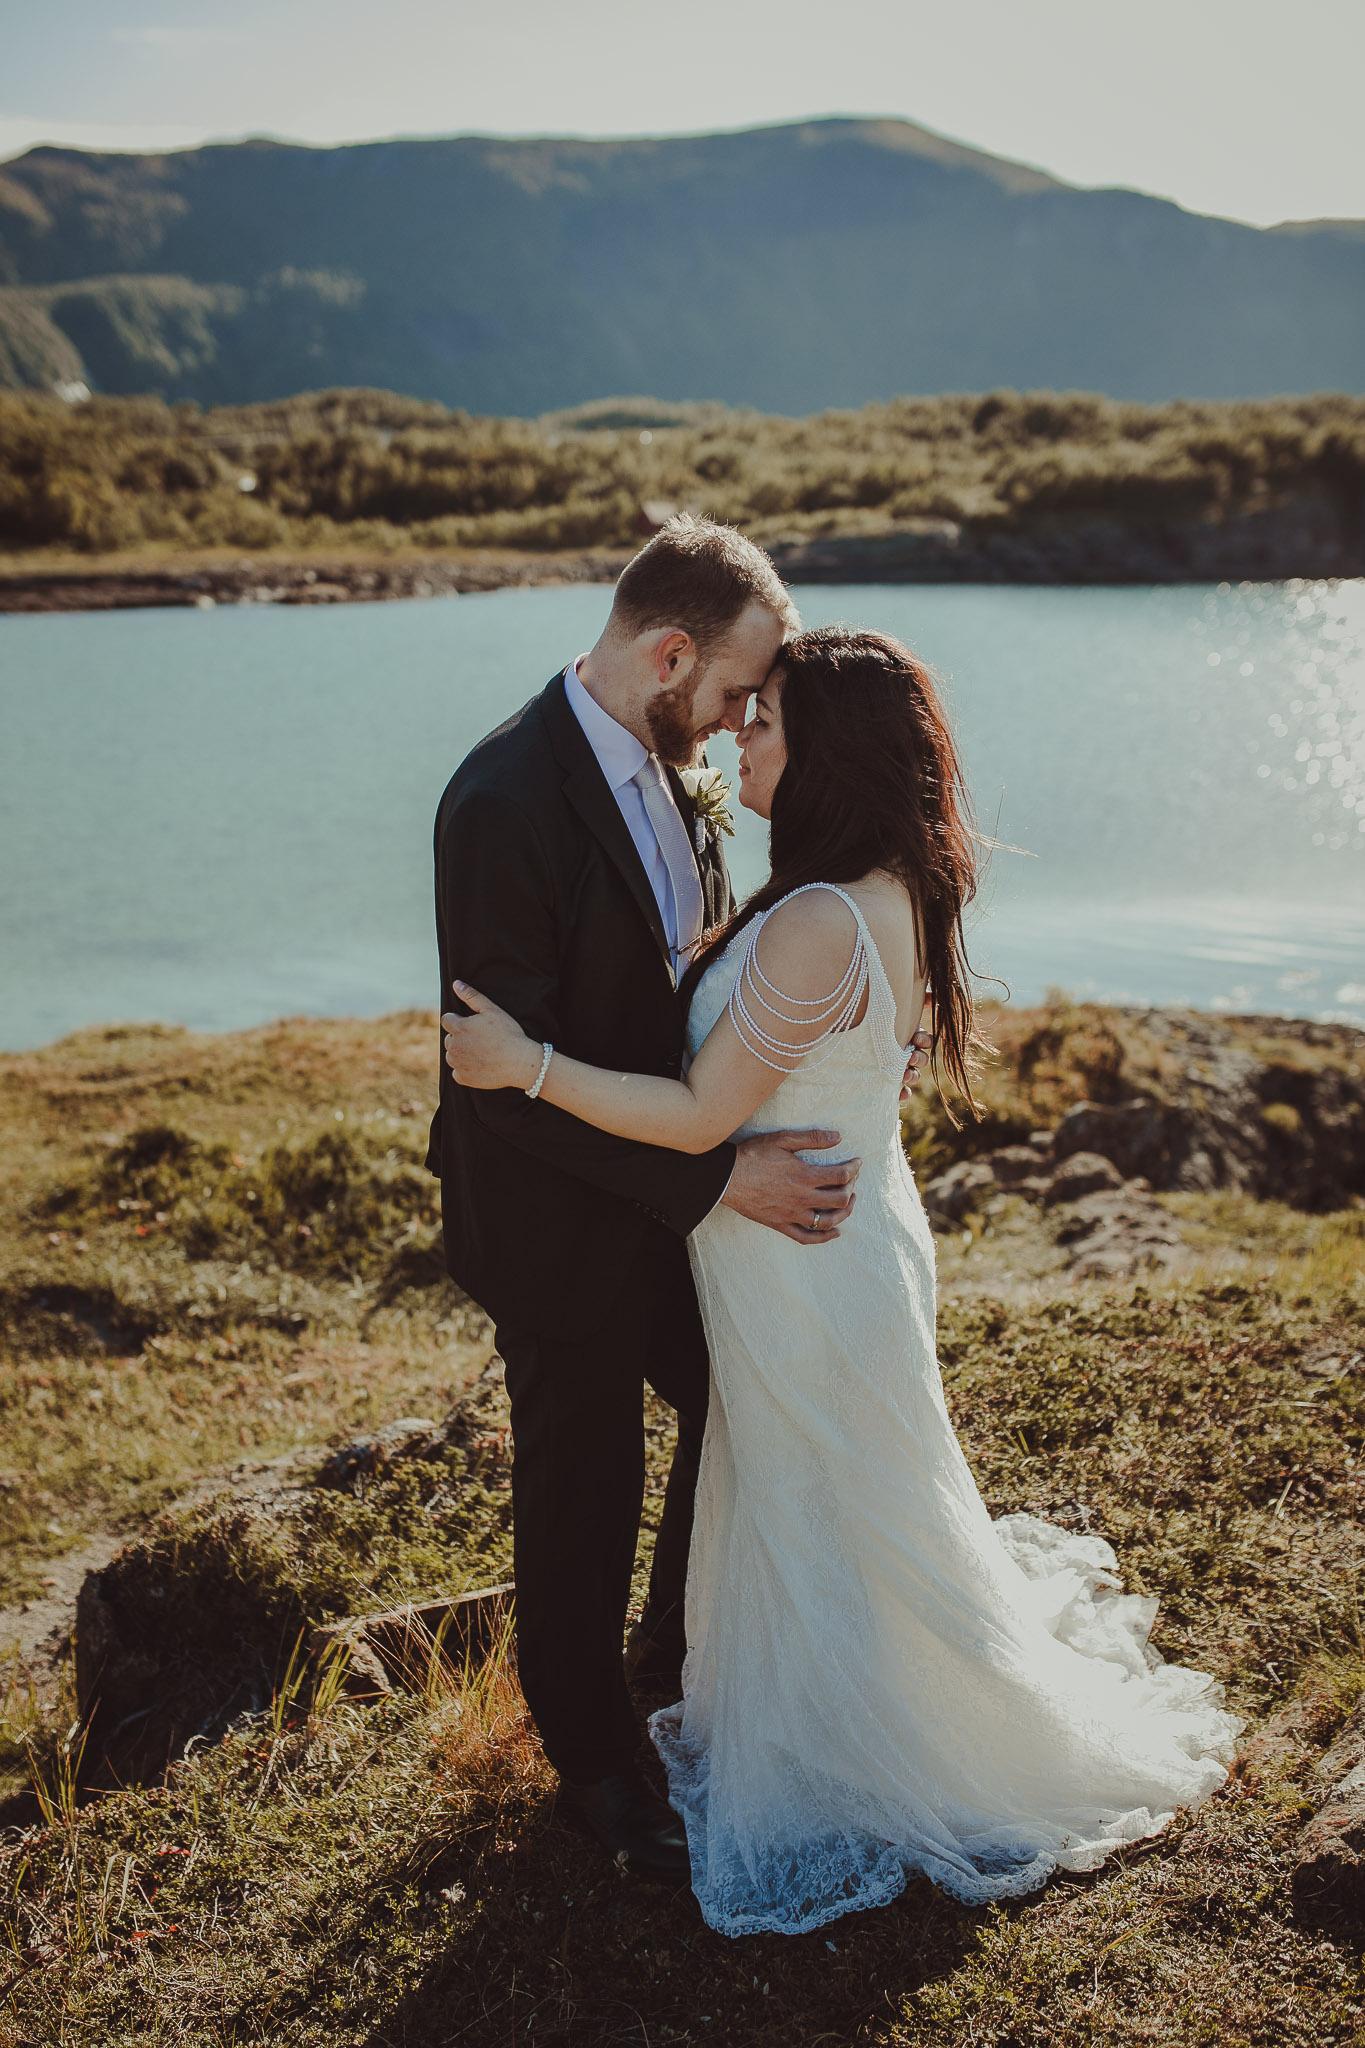 Bryllup-bodø-mjelle-bryllupsfotografering-4